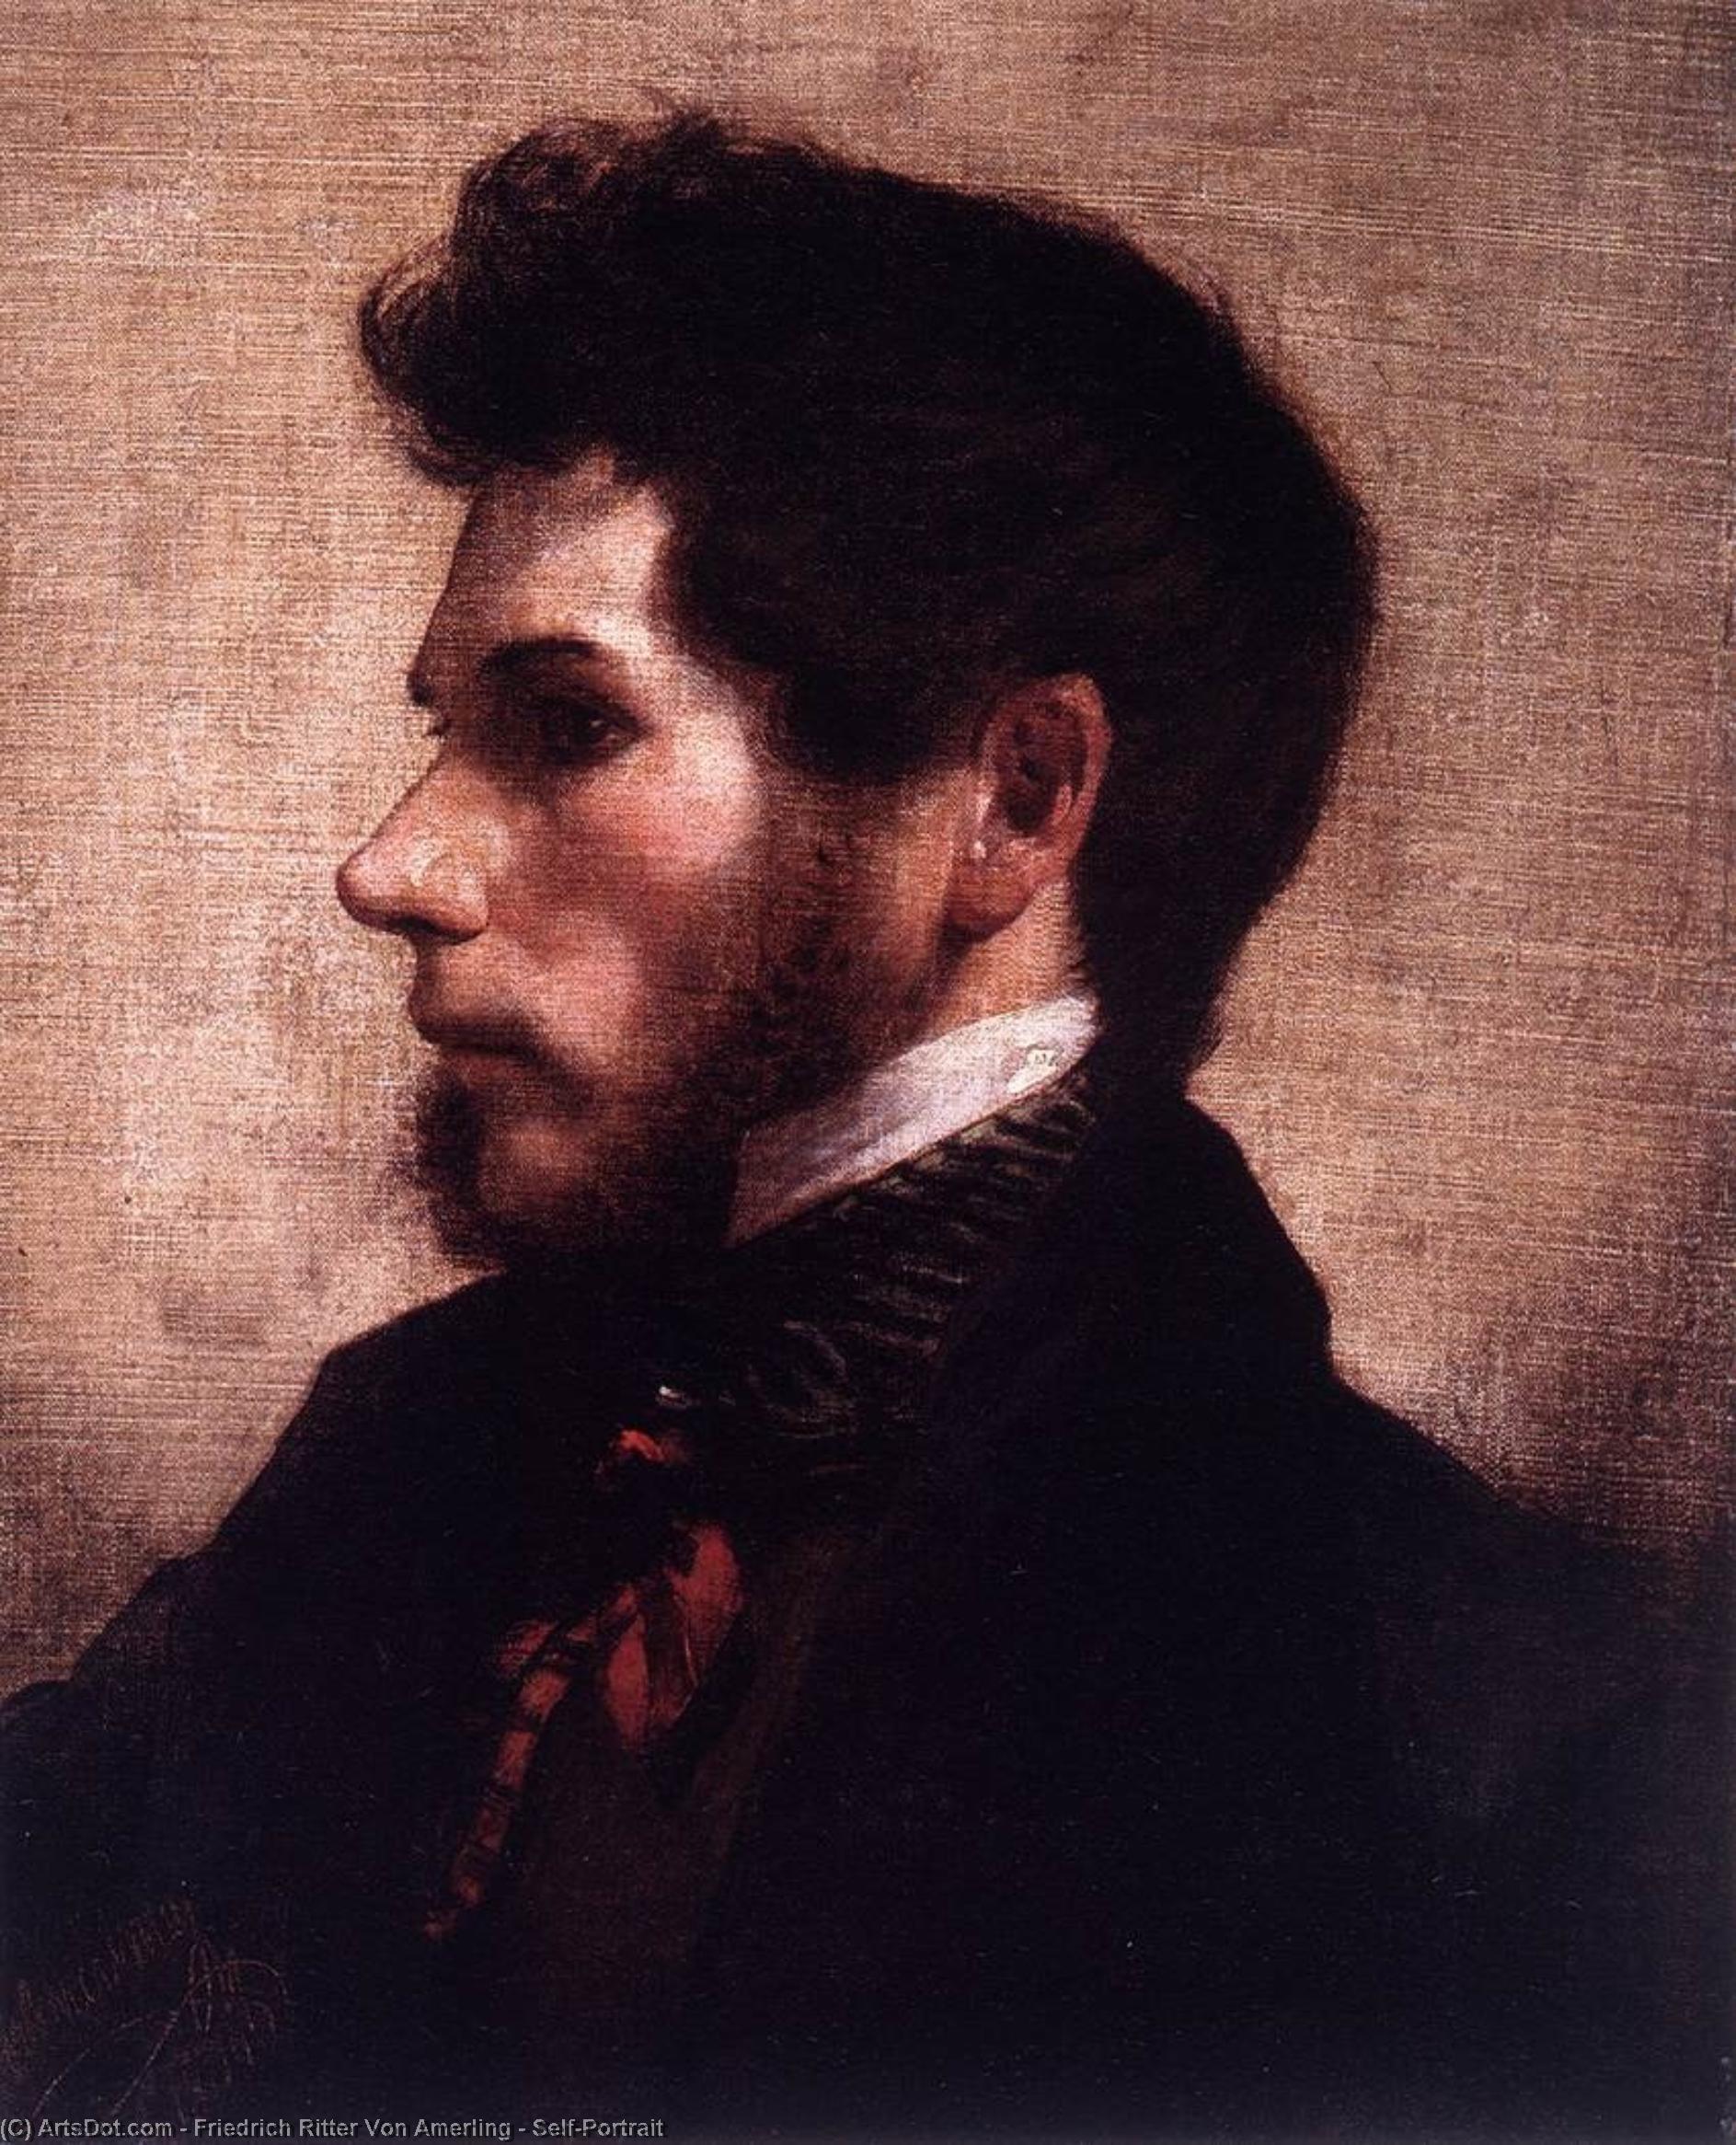 WikiOO.org - Güzel Sanatlar Ansiklopedisi - Resim, Resimler Friedrich Ritter Von Amerling - Self-Portrait